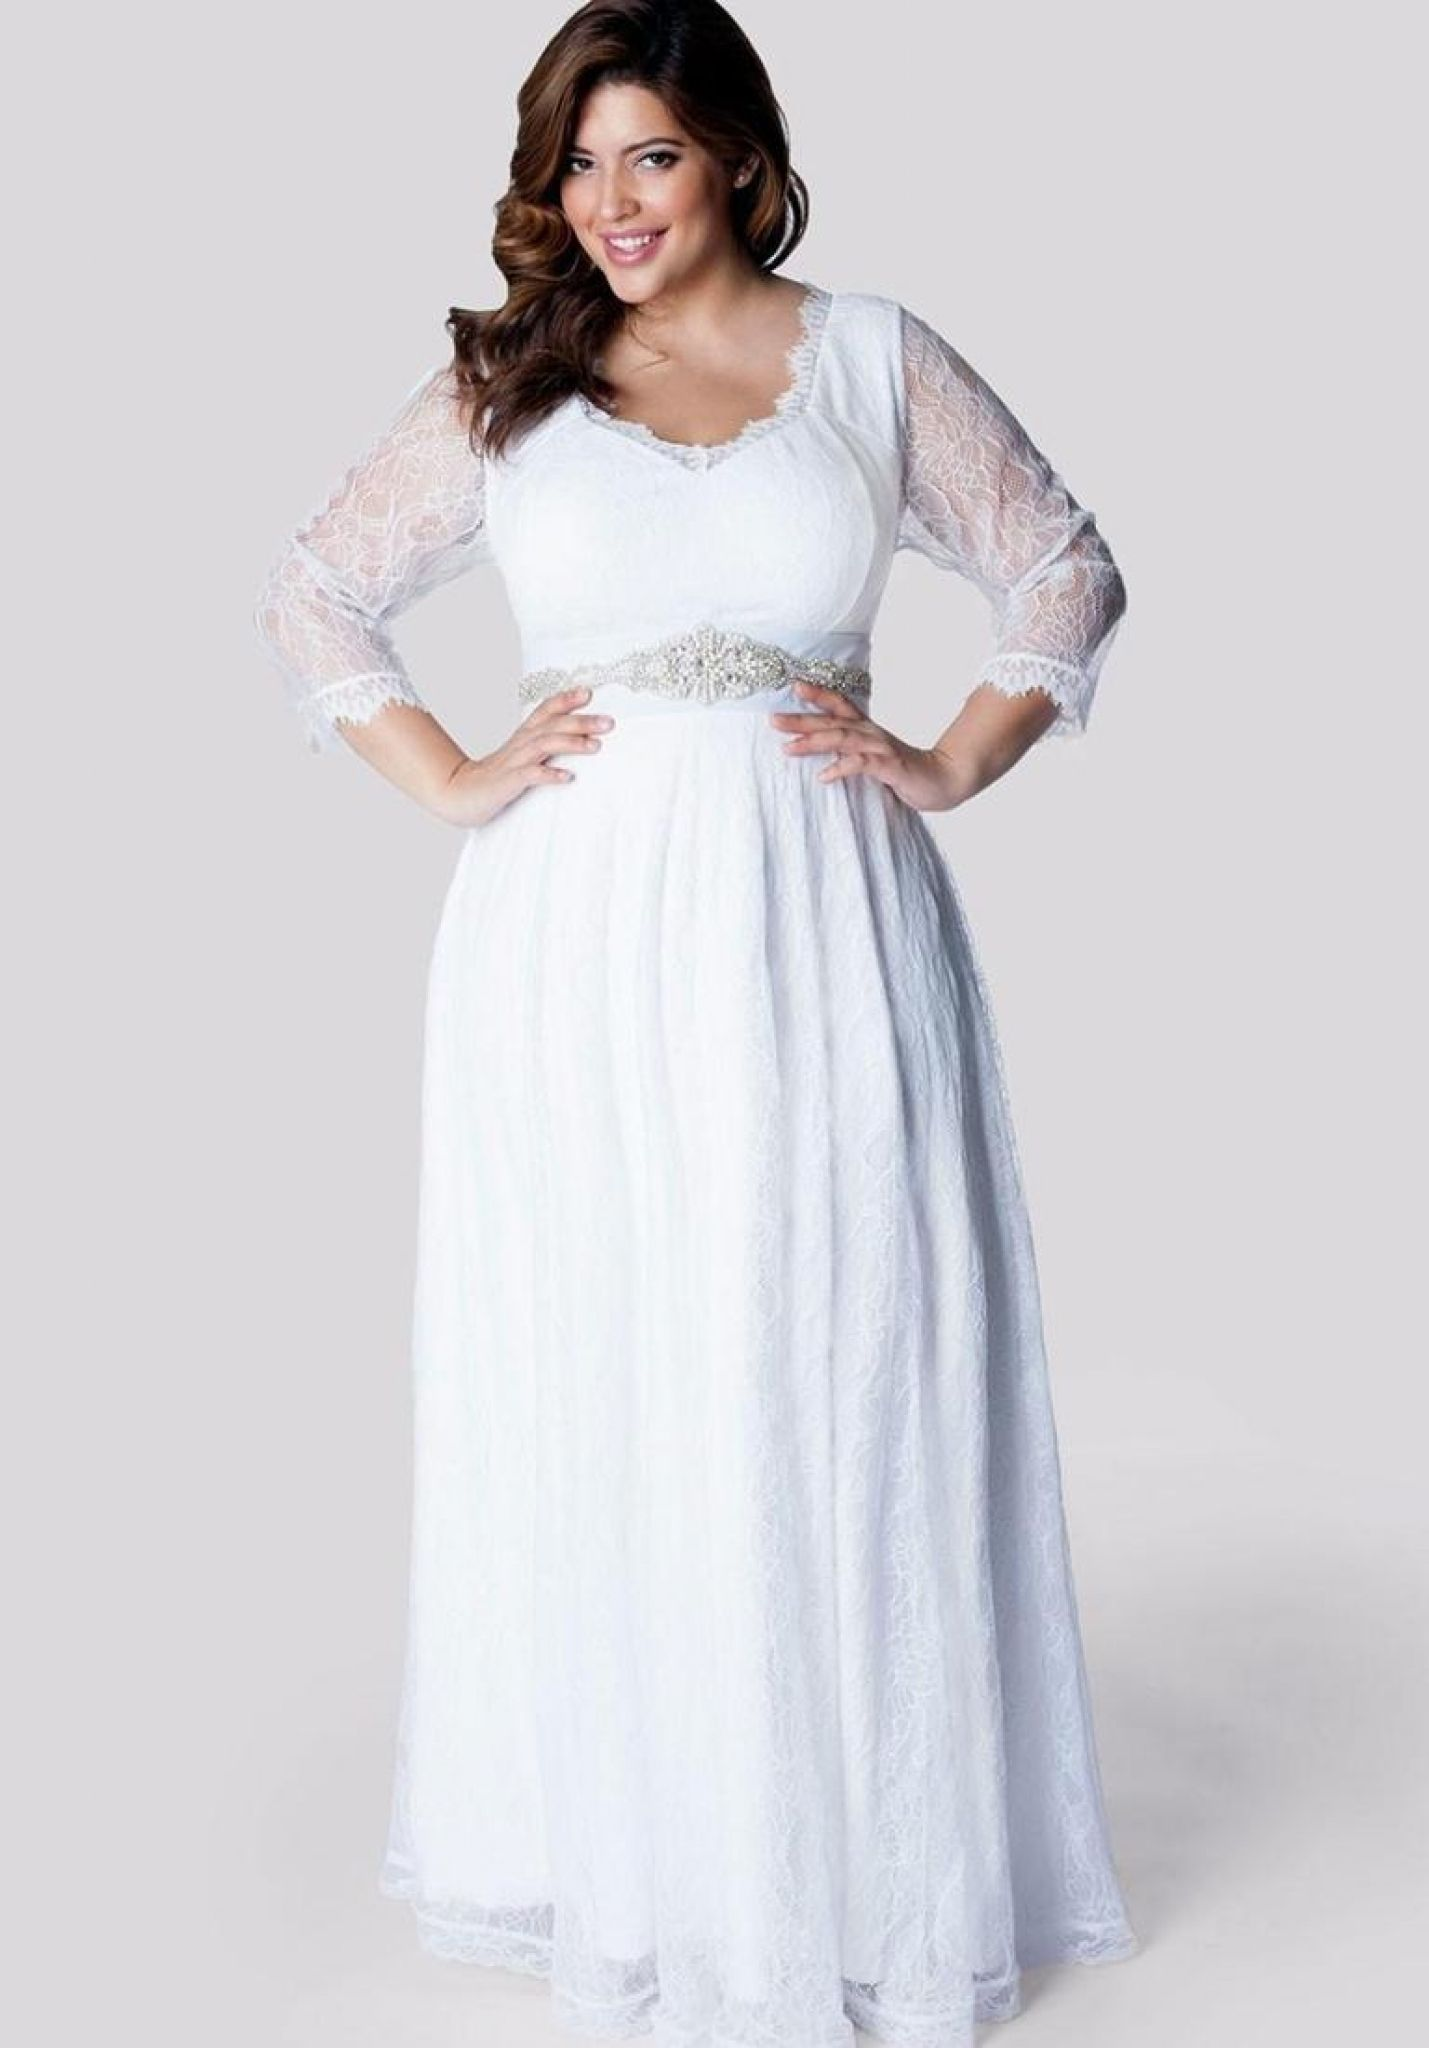 modest plus size wedding dresses - wedding dresses for the mature b ...